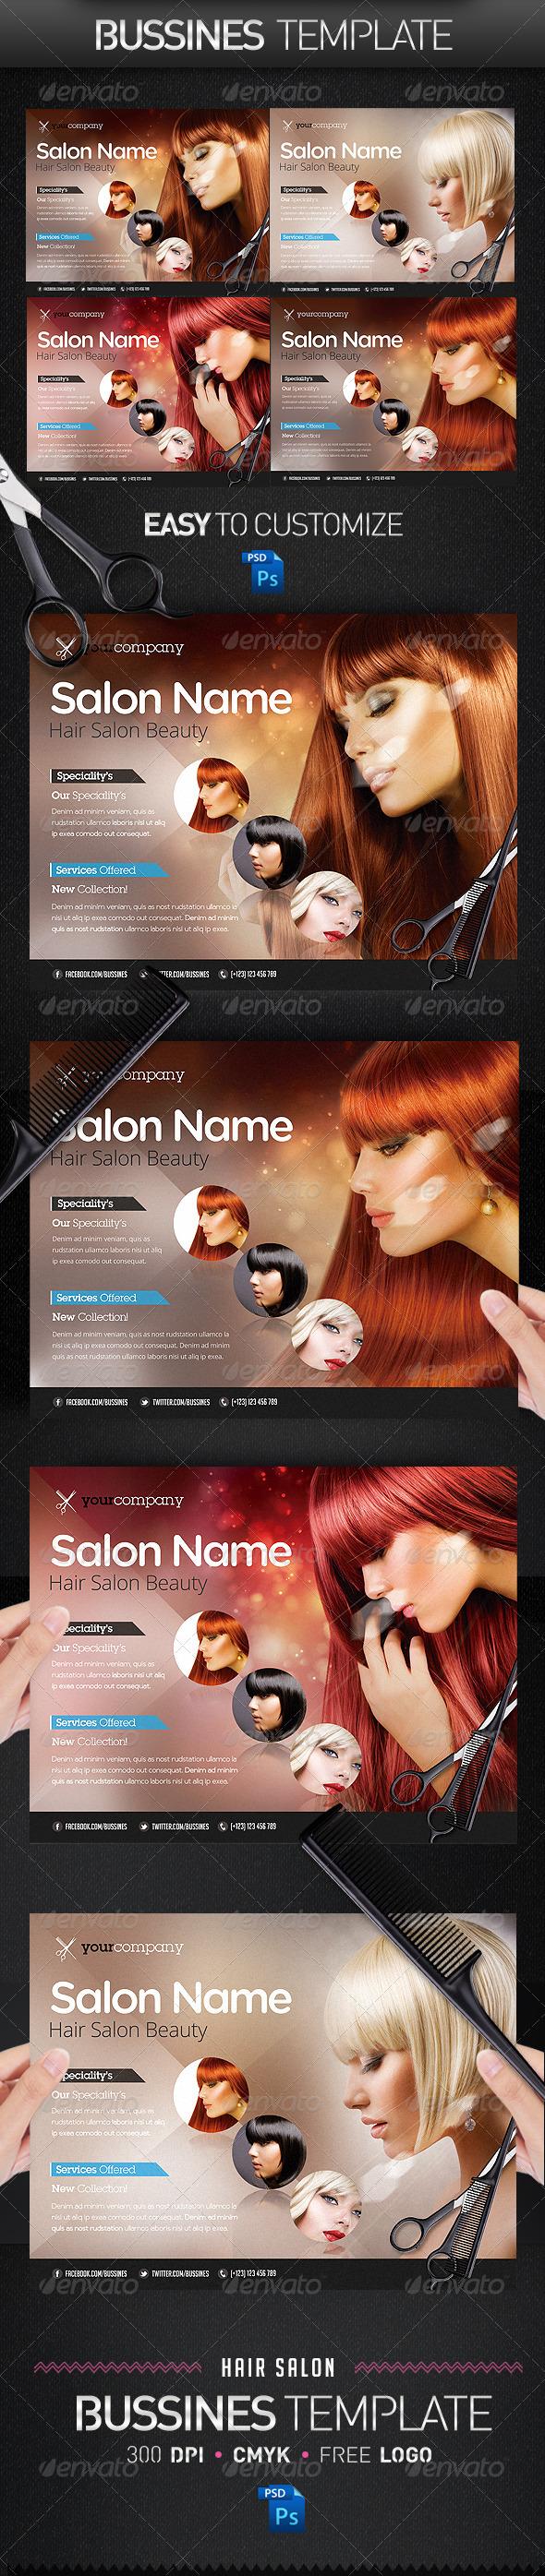 GraphicRiver Hair Salon PRO Bussines Promotional Flyer 3950786